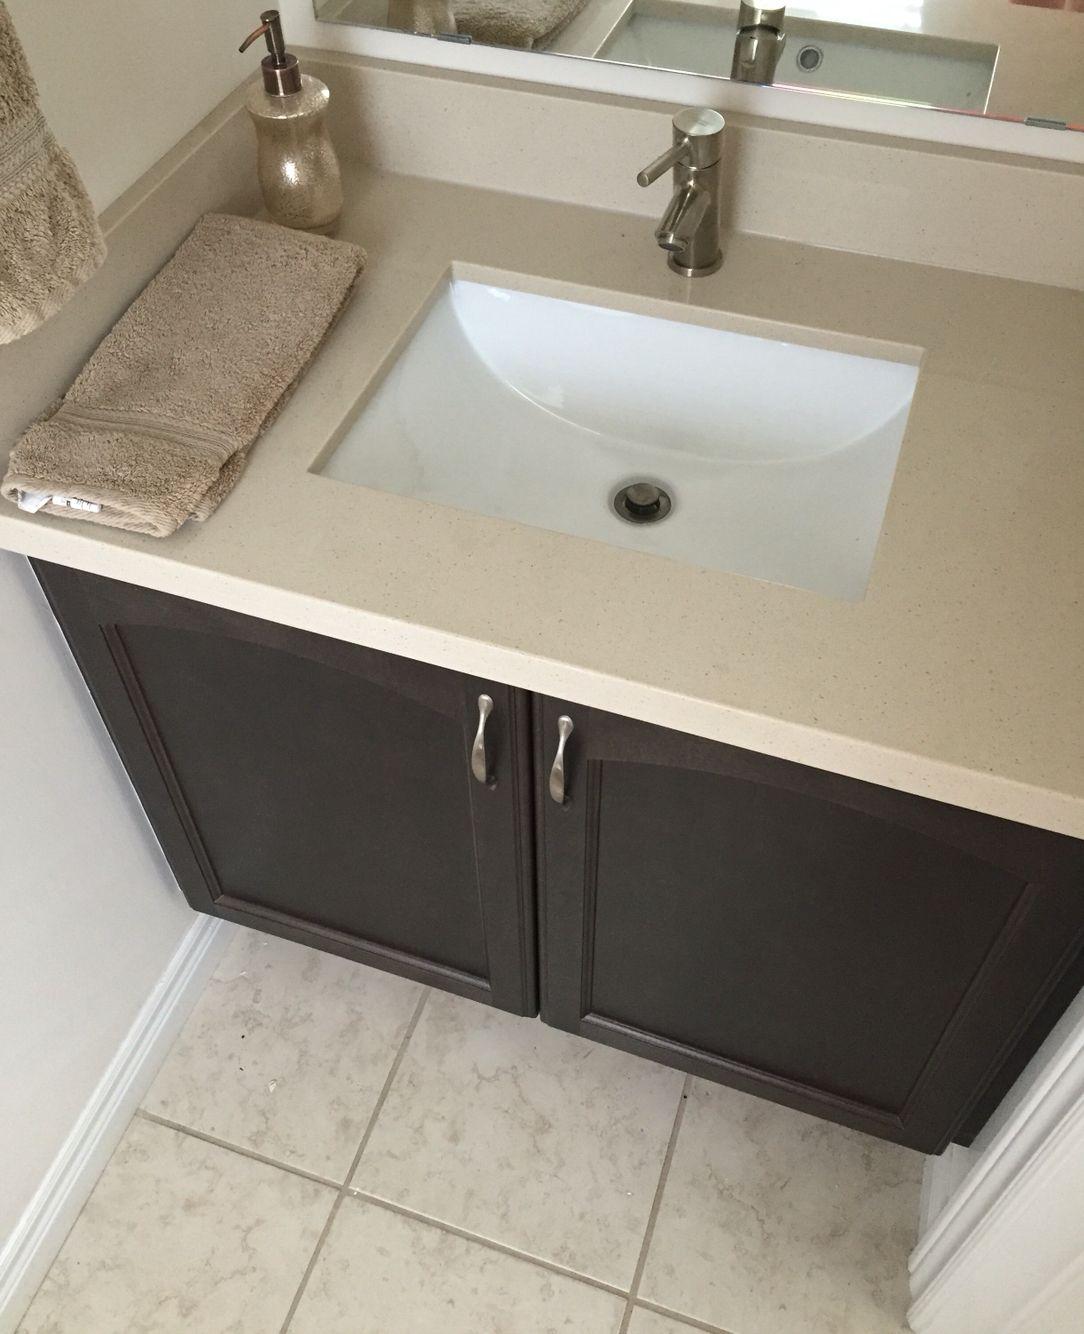 Pebble Rock Quartz Bathroom Countertop Bathroom Countertops